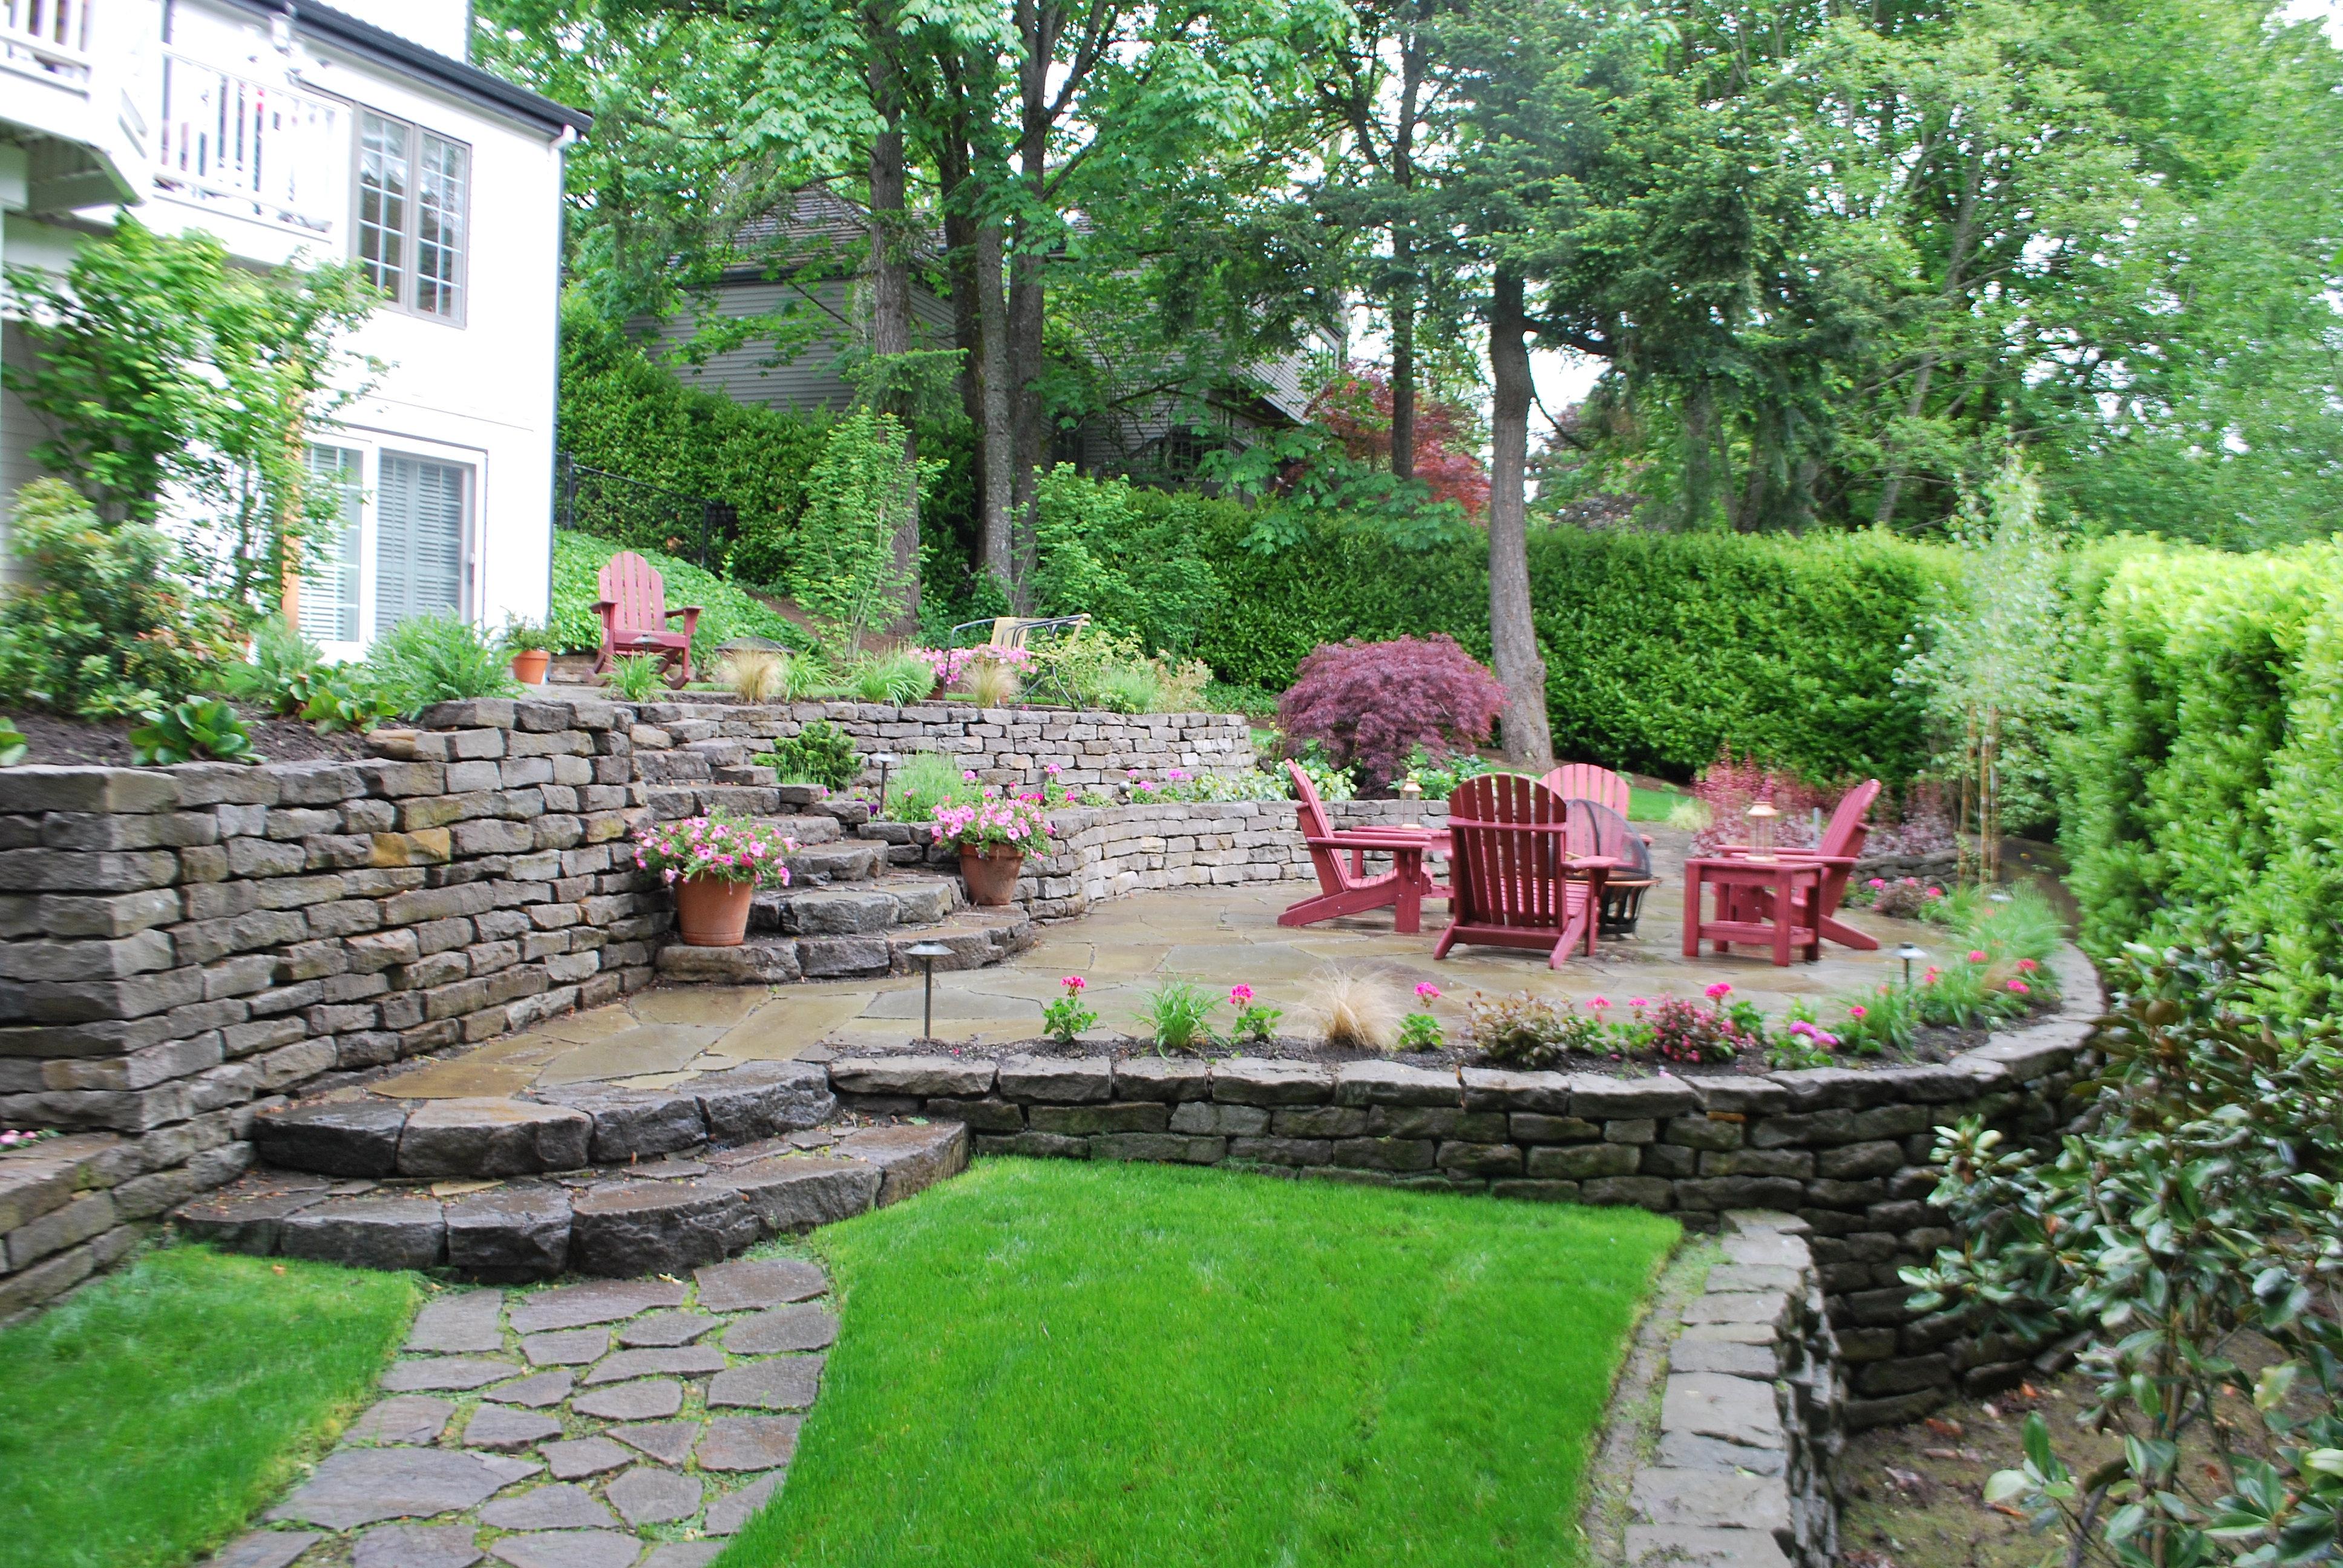 Plymouth Creek Design - Professional Landscaping | Landscape Design